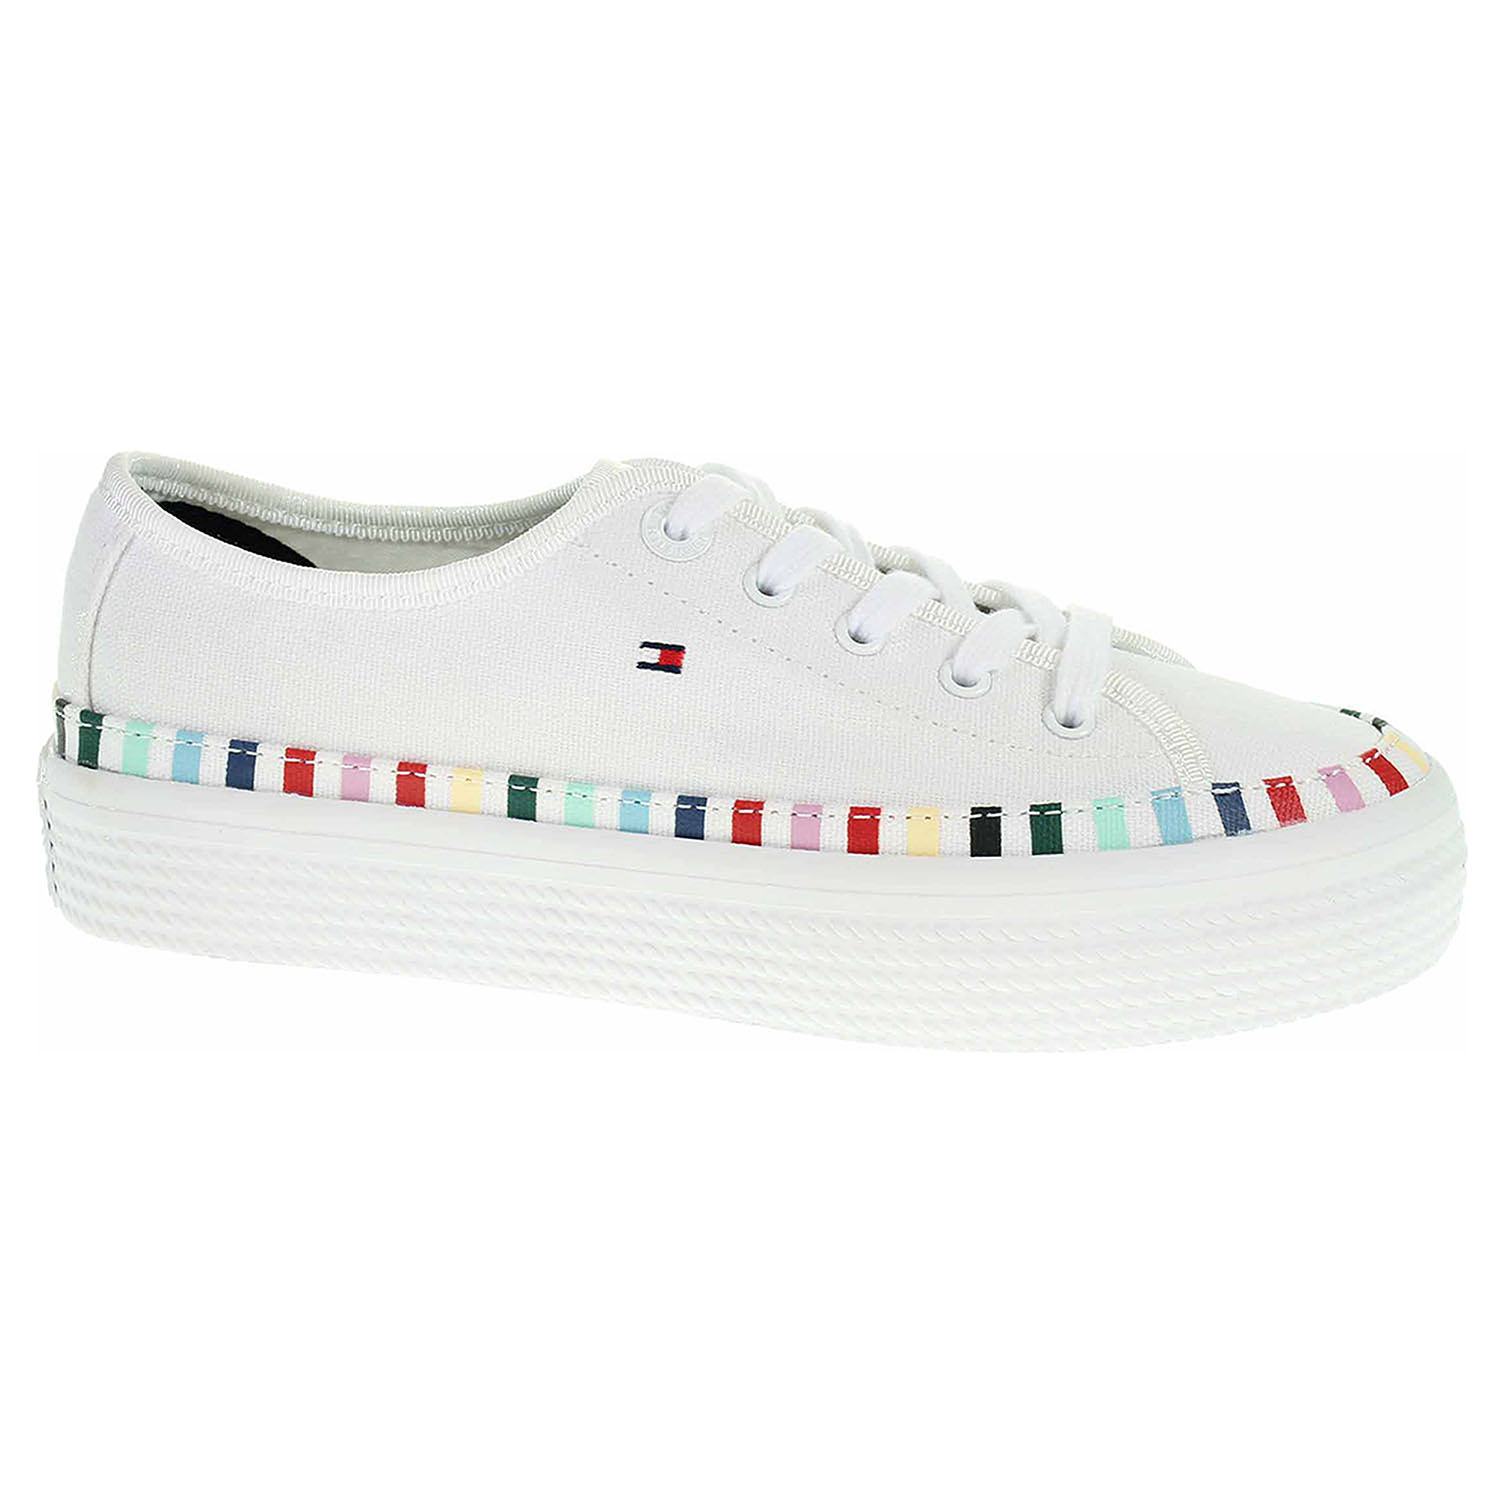 f4726f284 Dámská obuv Tommy Hilfiger FW0FW04069 100 white | Rejnok obuv